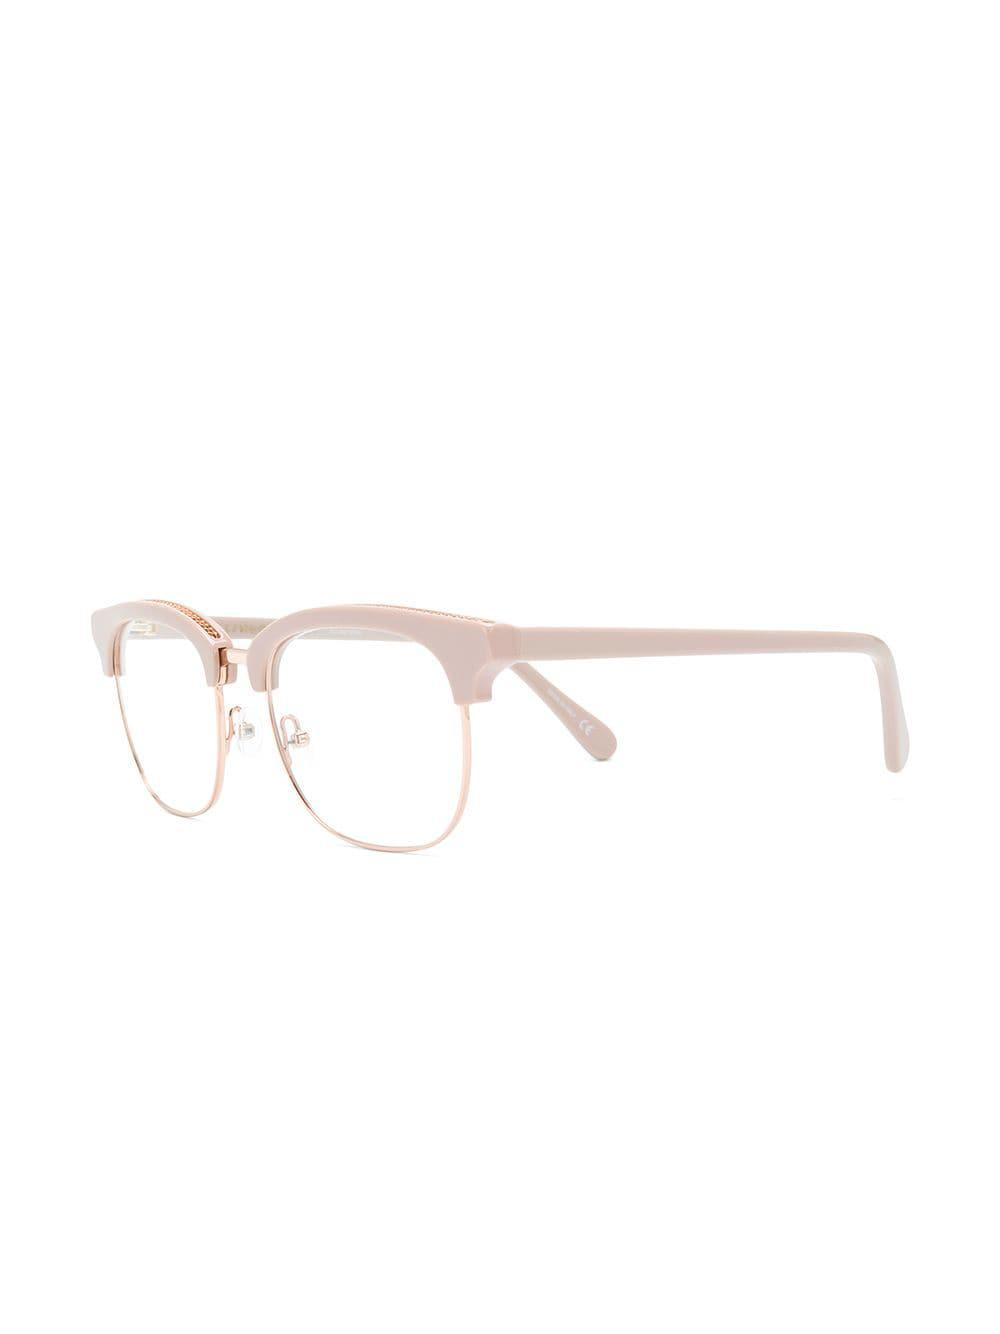 f51c061ebd Stella McCartney - Pink Squared Frame Glasses - Lyst. View fullscreen